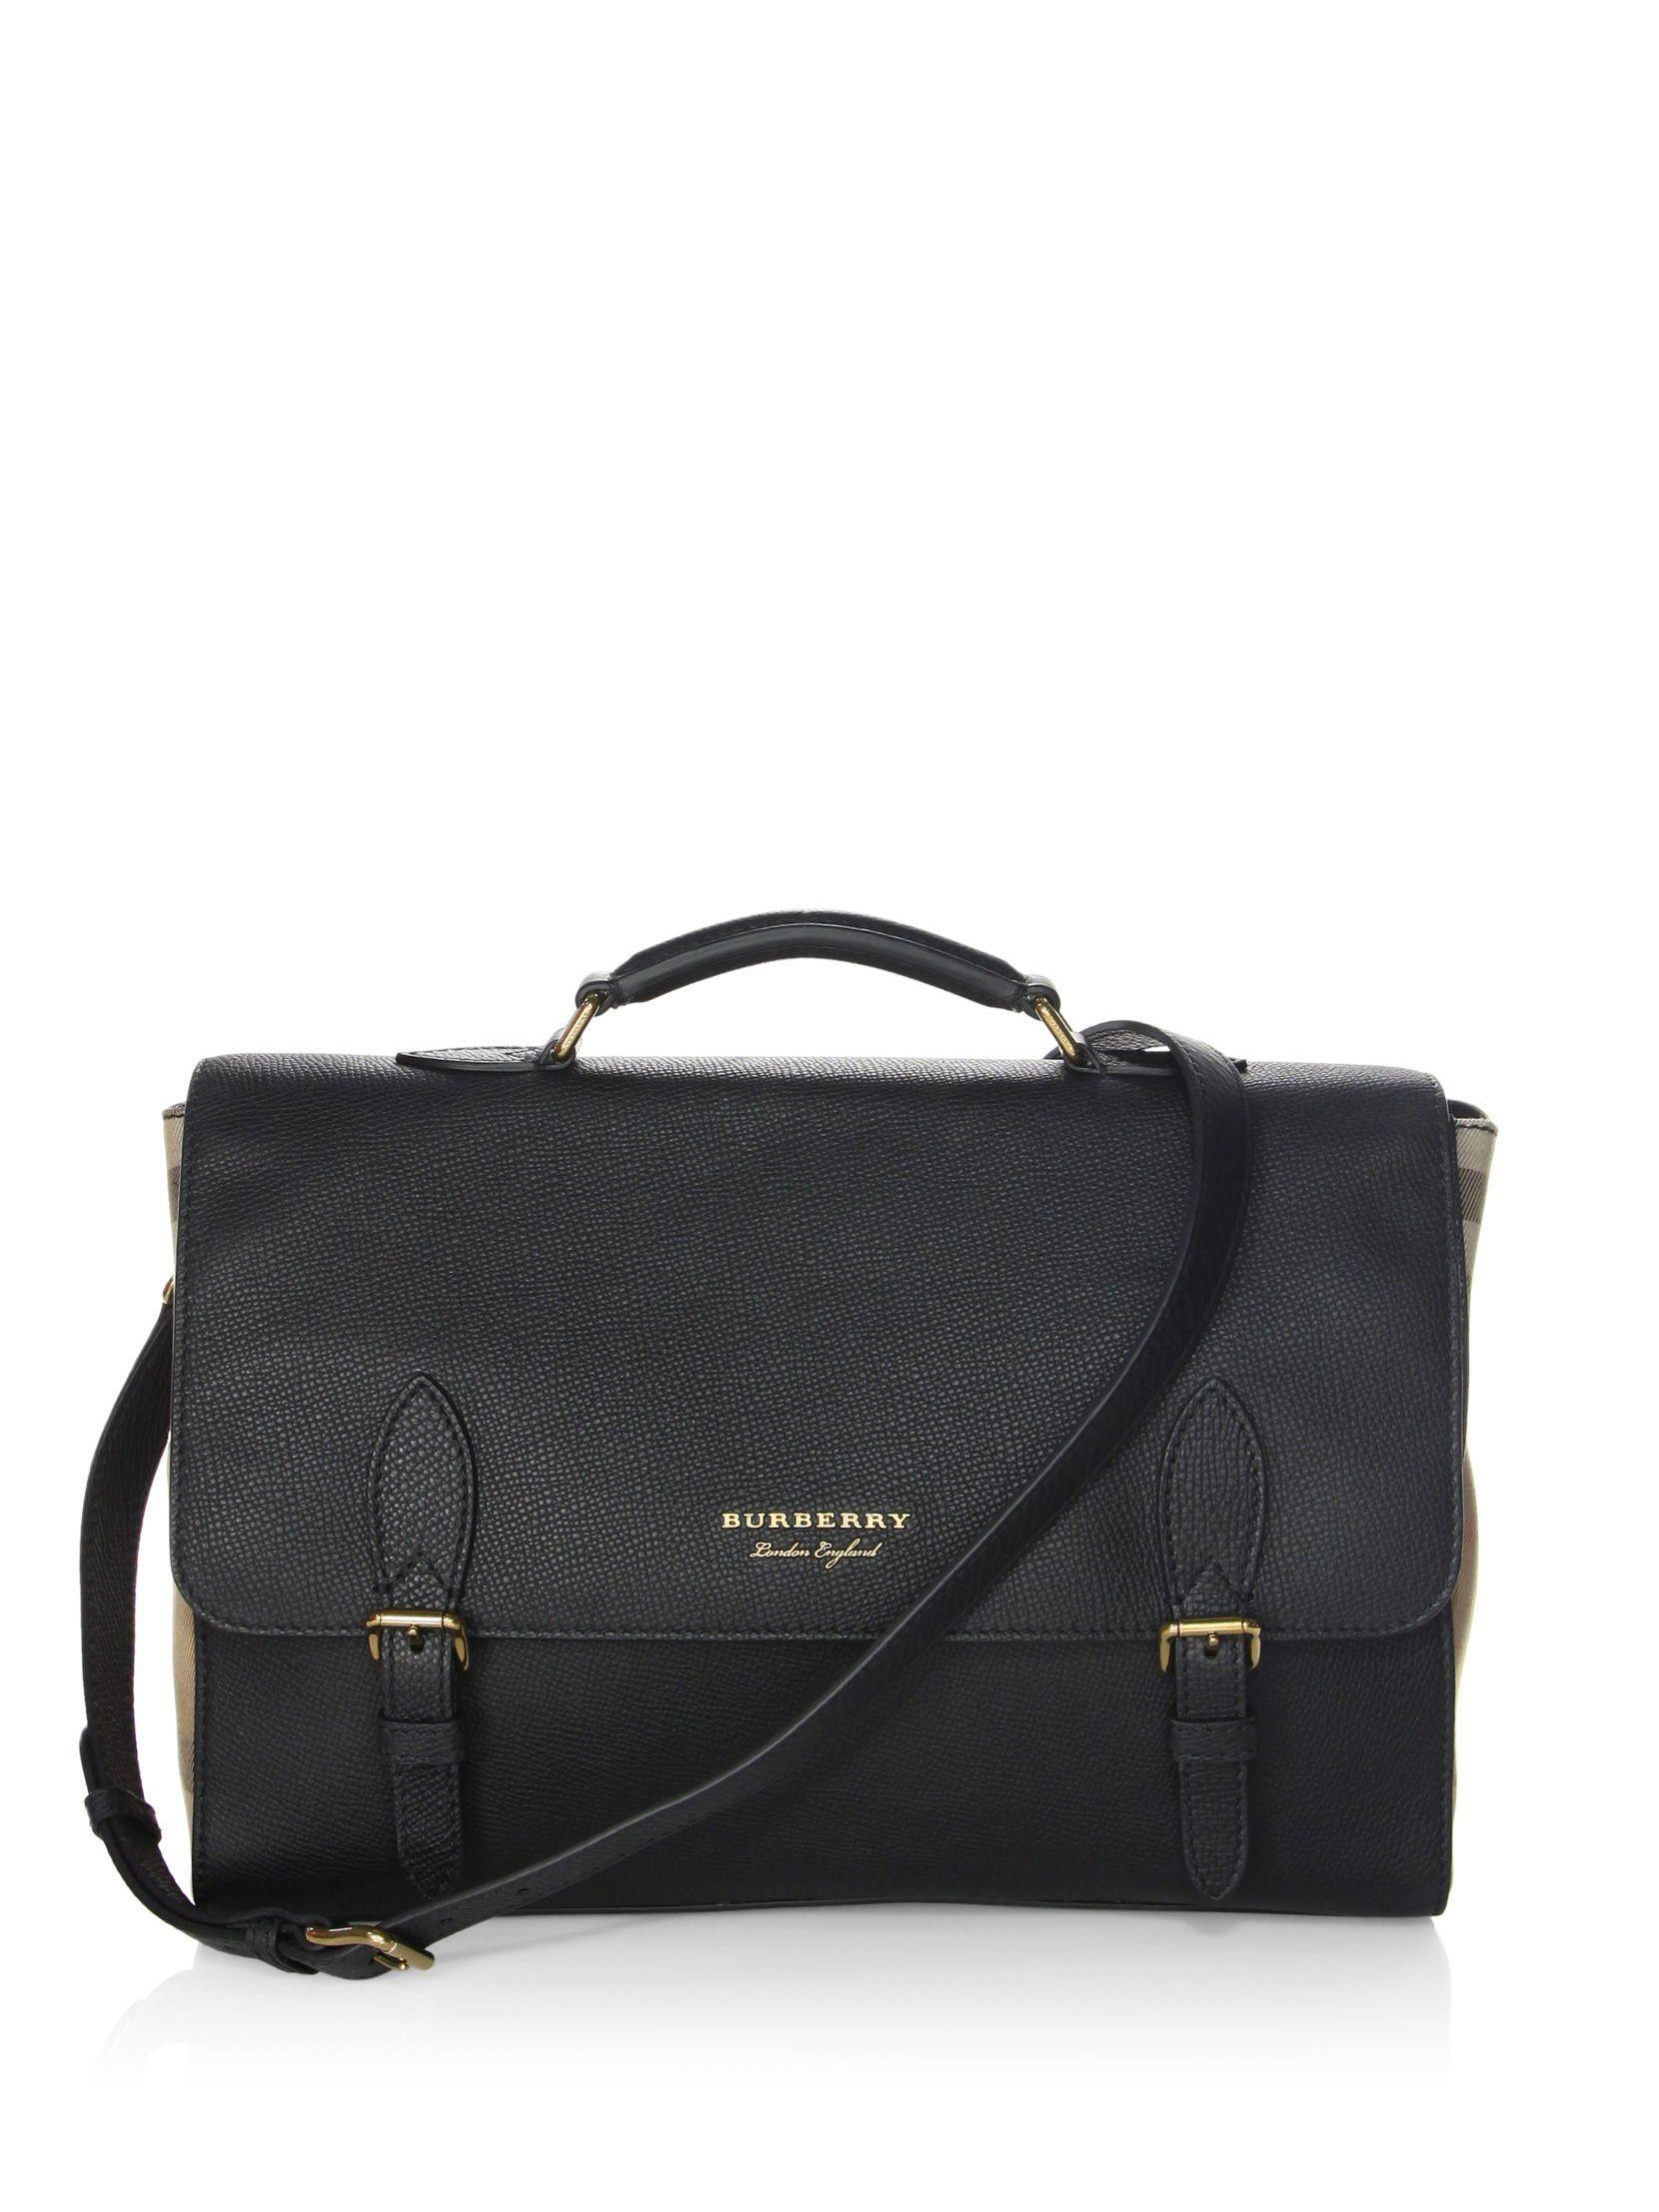 Burberry Ethan Leather Messenger Bag  6d8d8206147ea